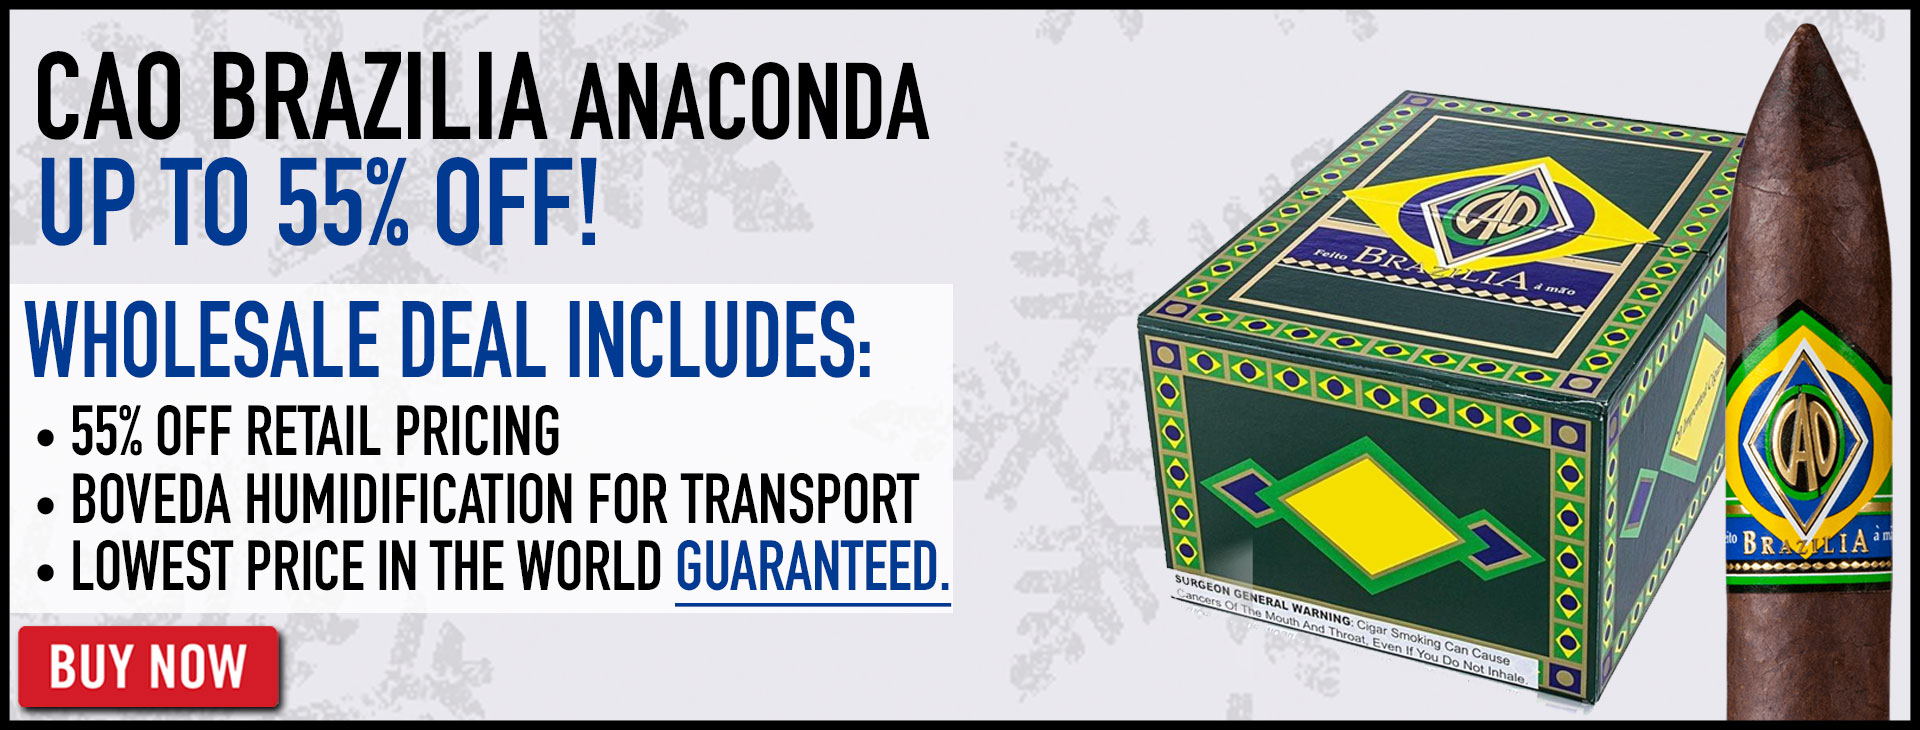 cao-brazilia-anaconda-2021-banner.jpg